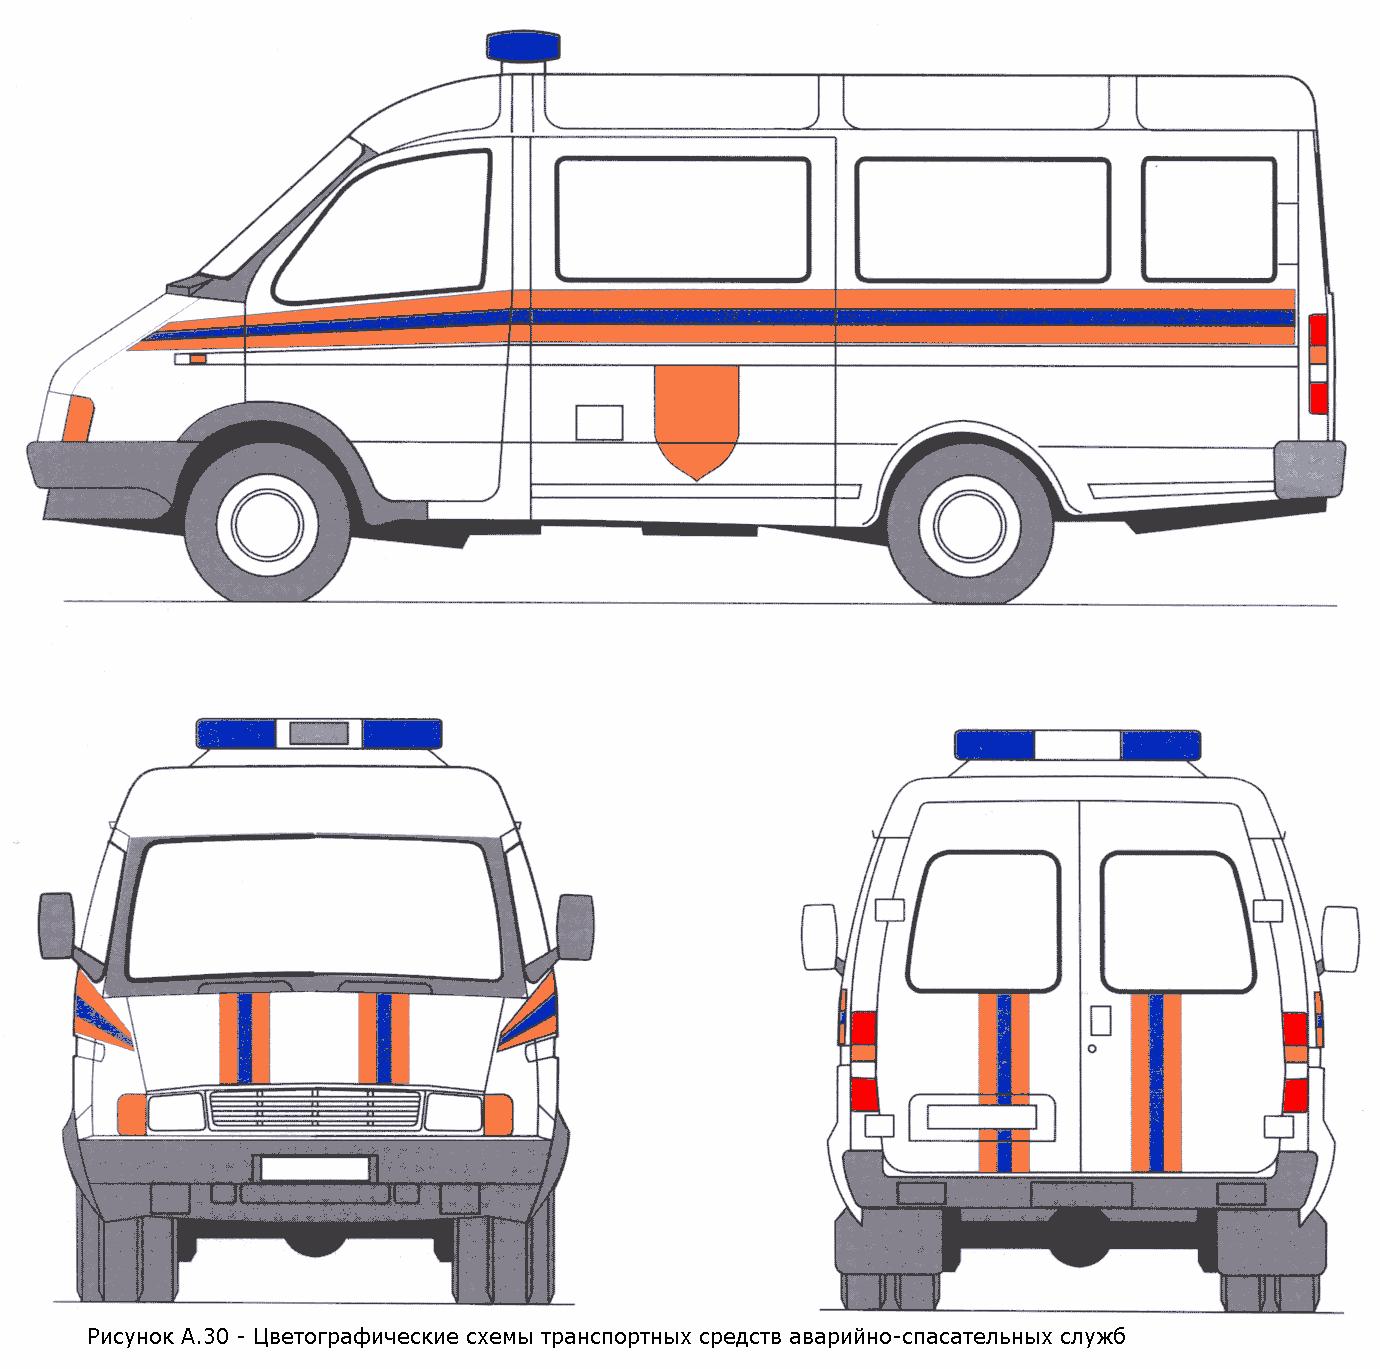 РИСУНОК А.30 (К ГОСТ Р 50574-2002)